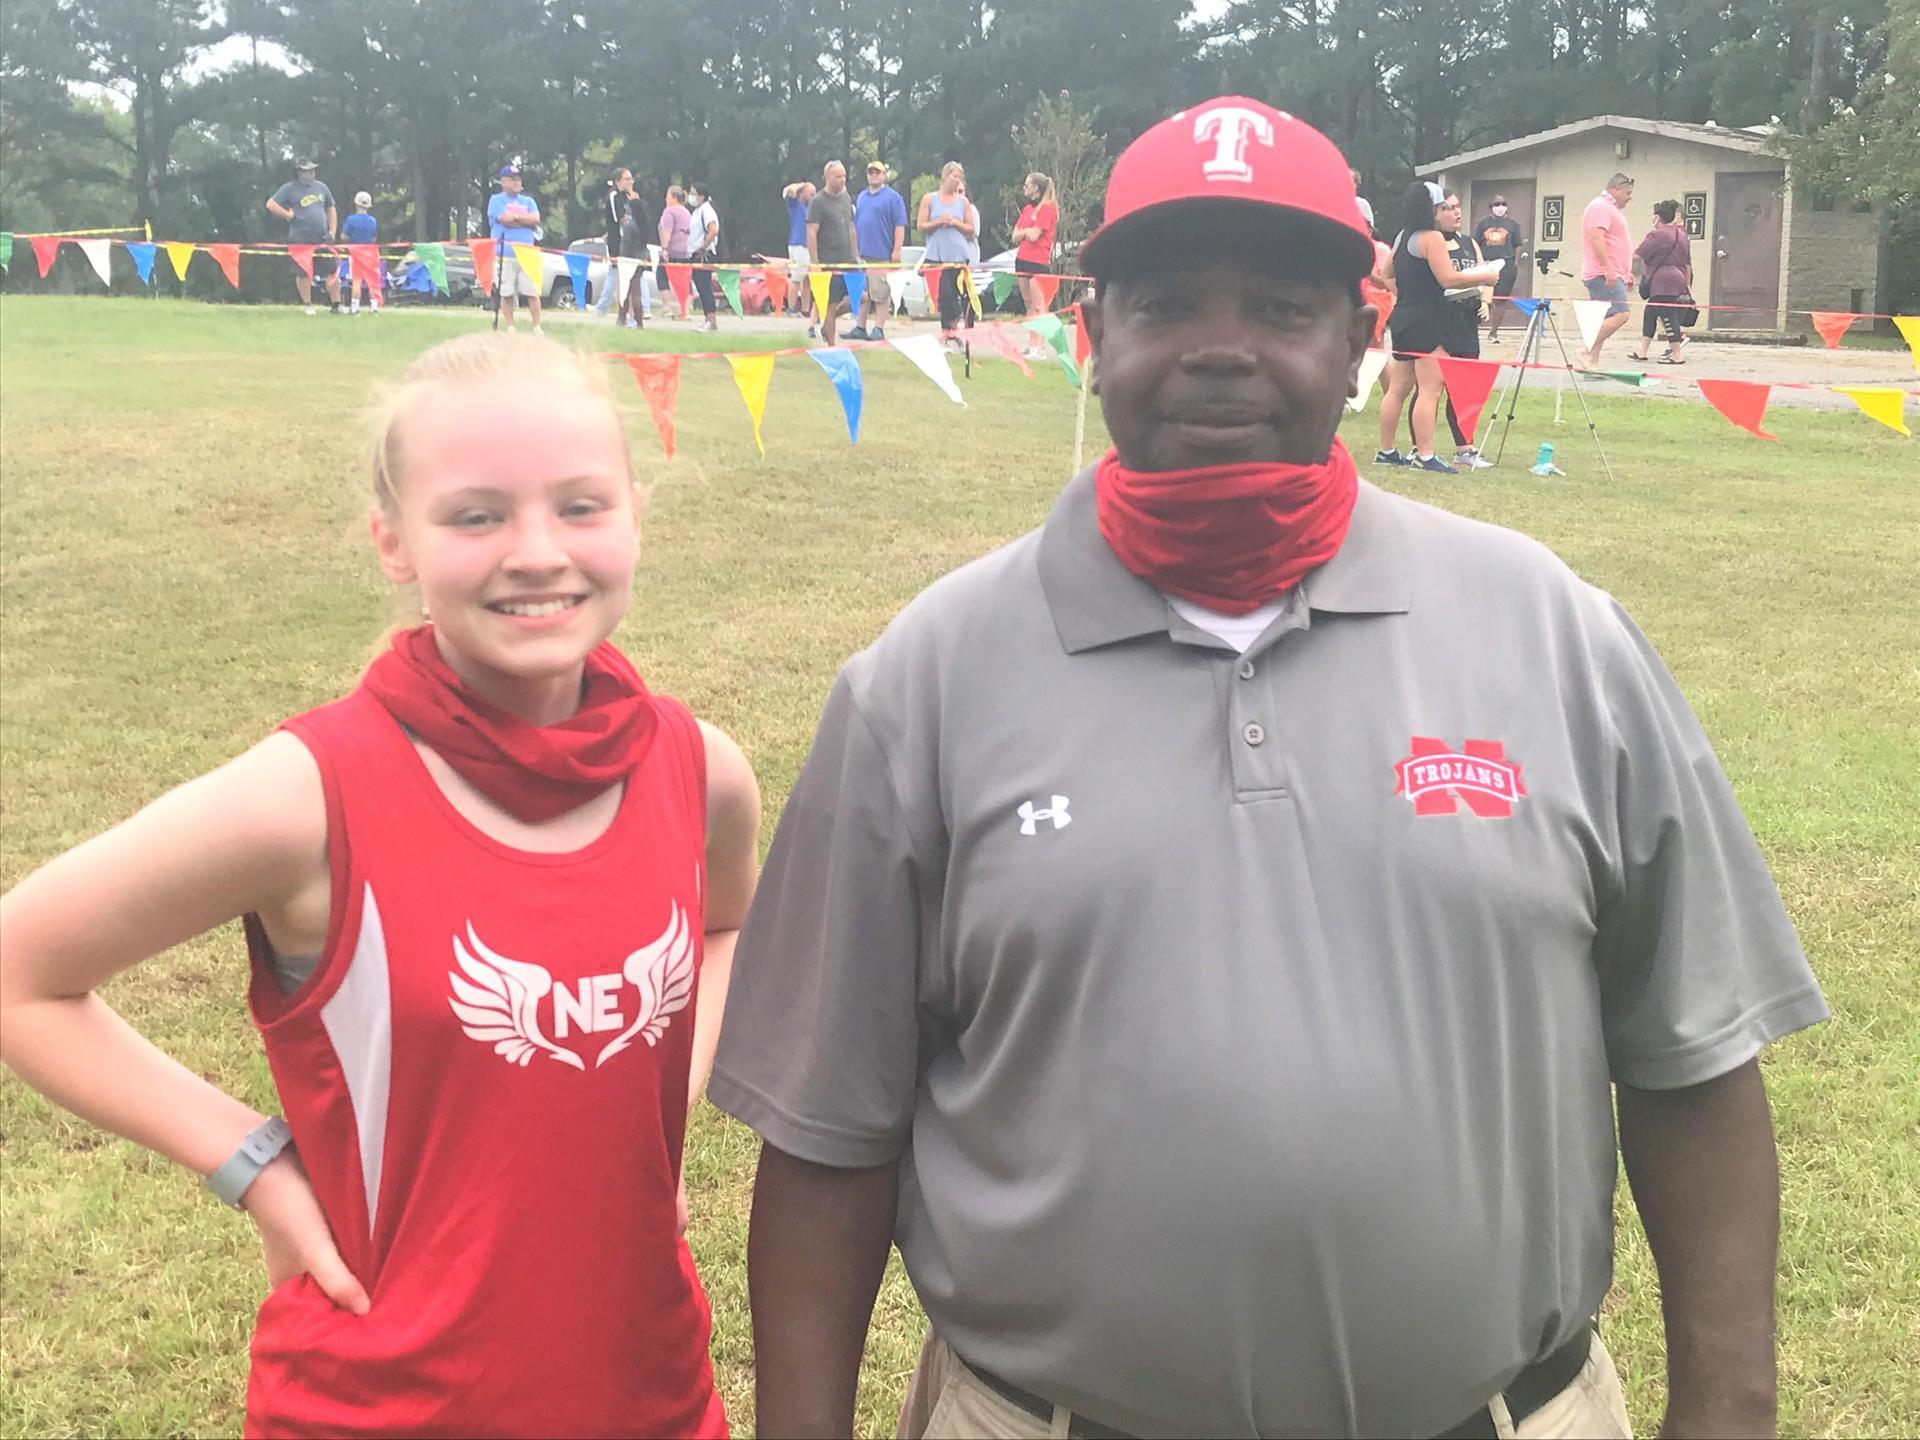 Northeast High School Cross Country Runner and Coach